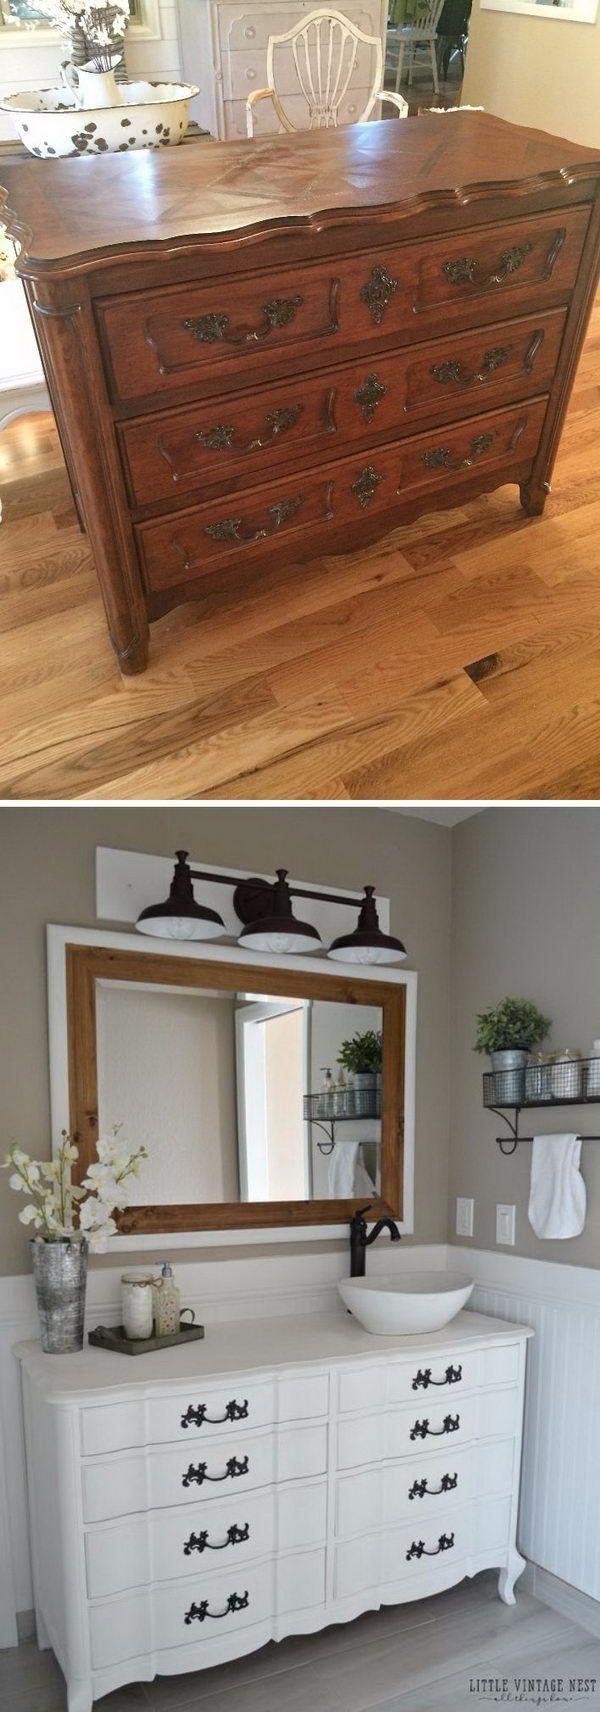 Amazing diy ideas to transform your old furniture bathroom